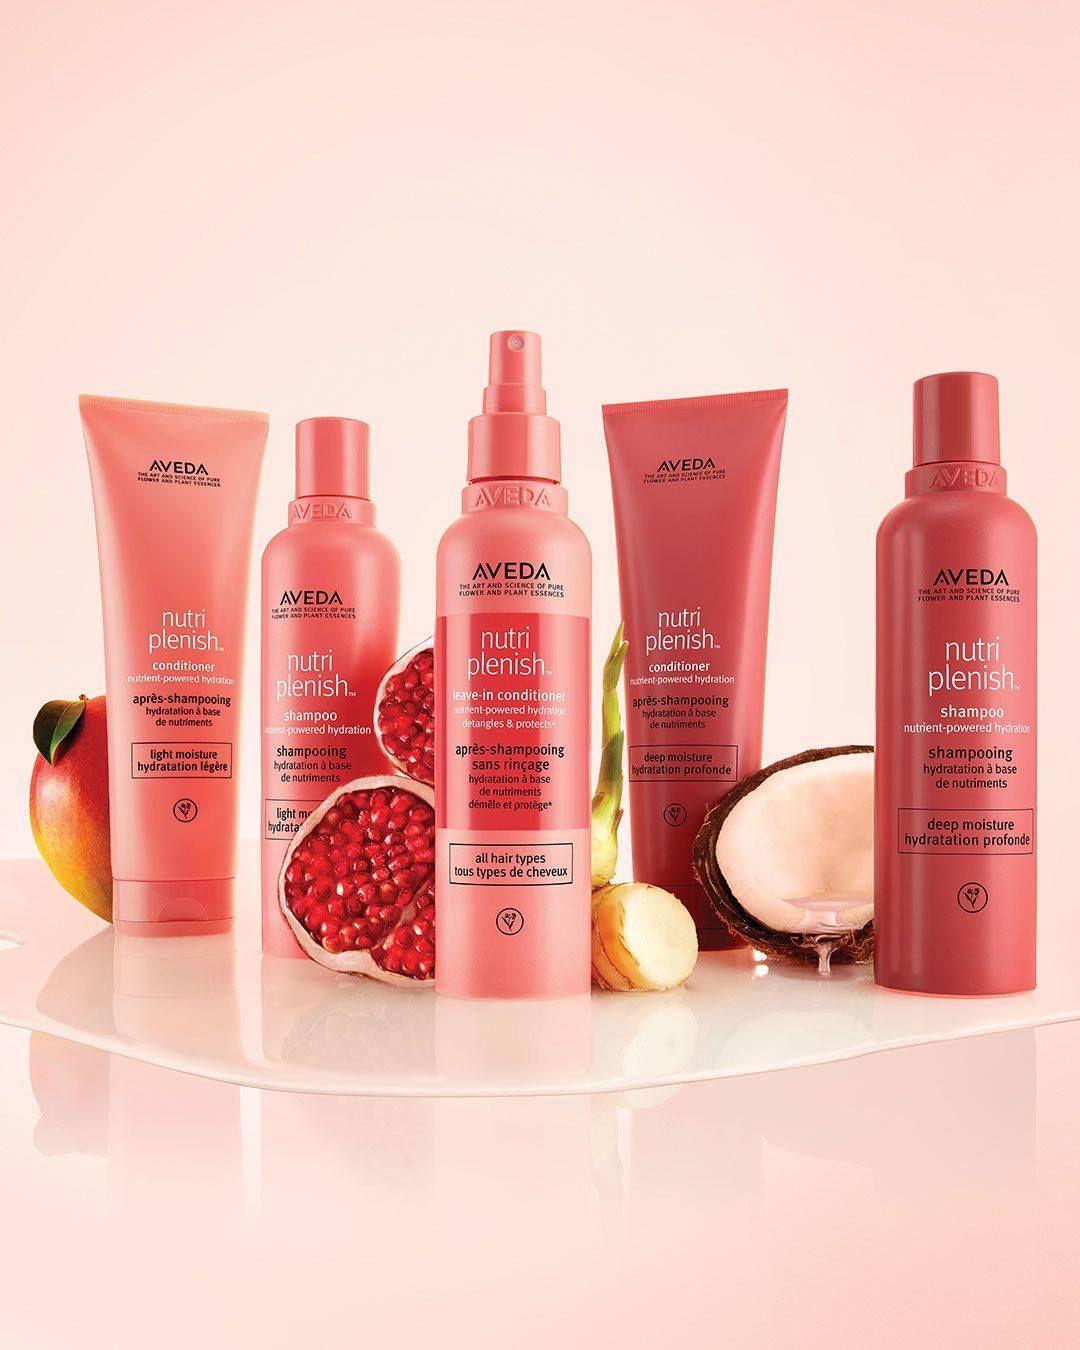 Nutriplenish Shampoo Conditioner Moisturize Dry Hair Good Shampoo And Conditioner Custom Shampoo